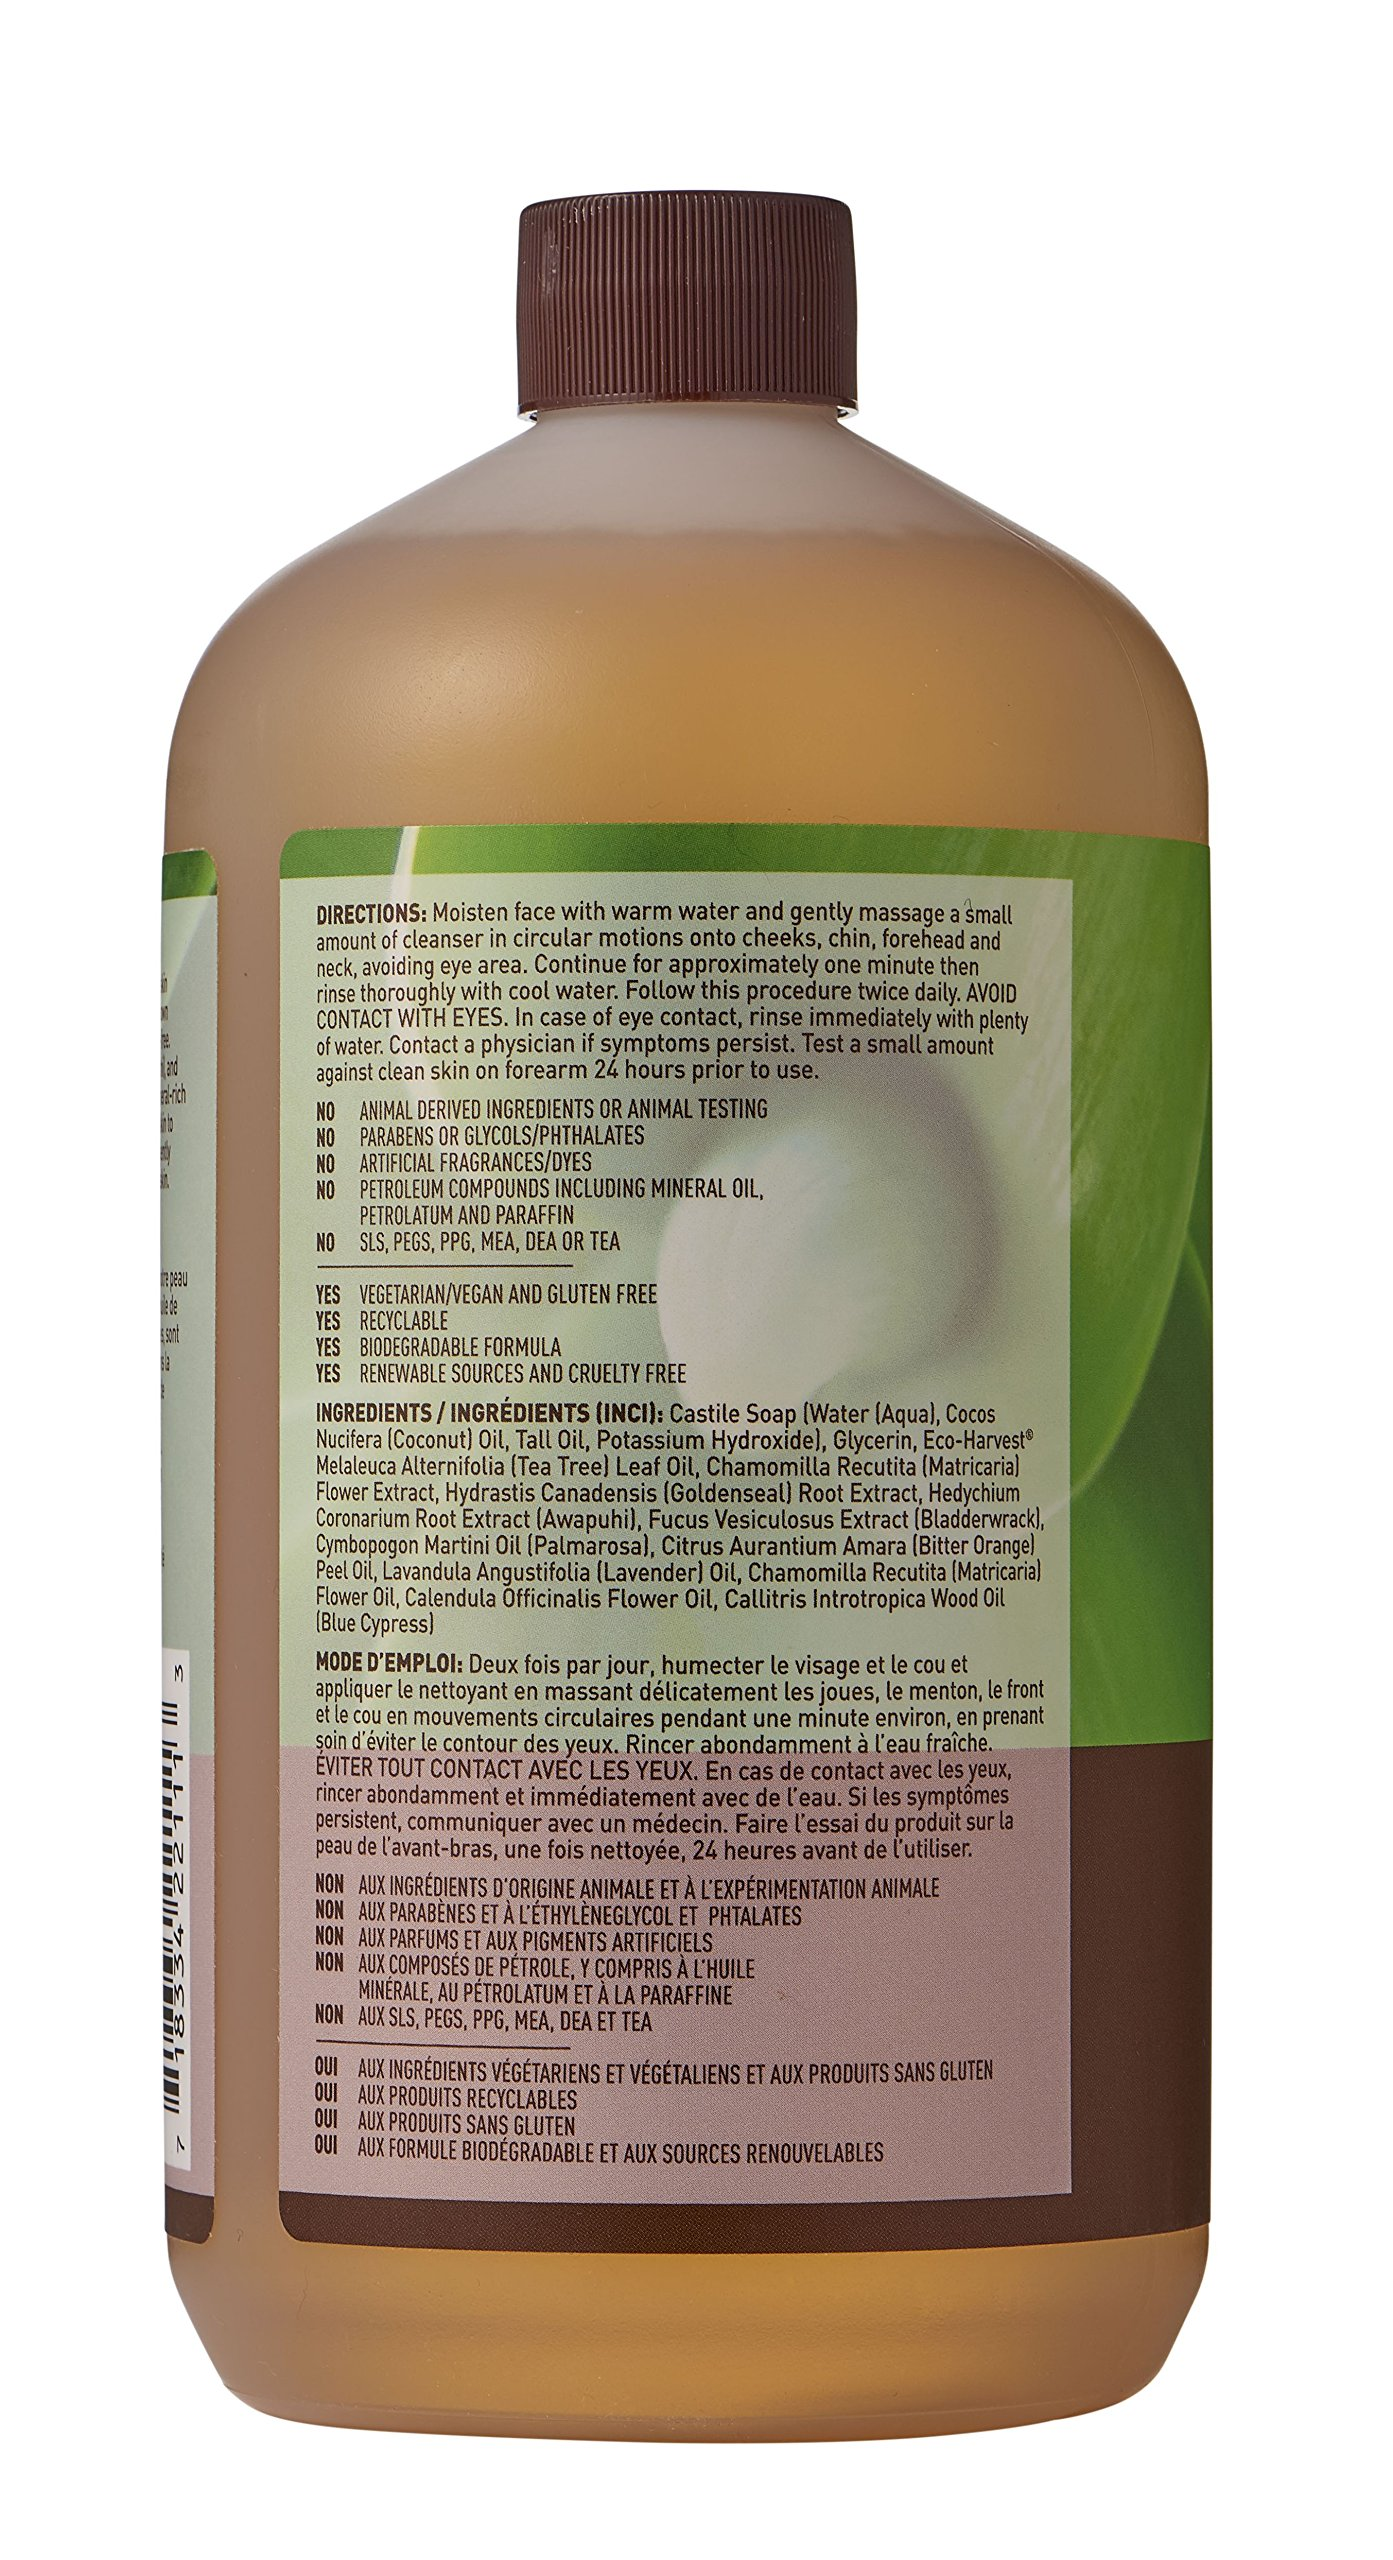 Desert Essence Thoroughly Clean Face Wash 32 fl oz by Desert Essence (Image #4)